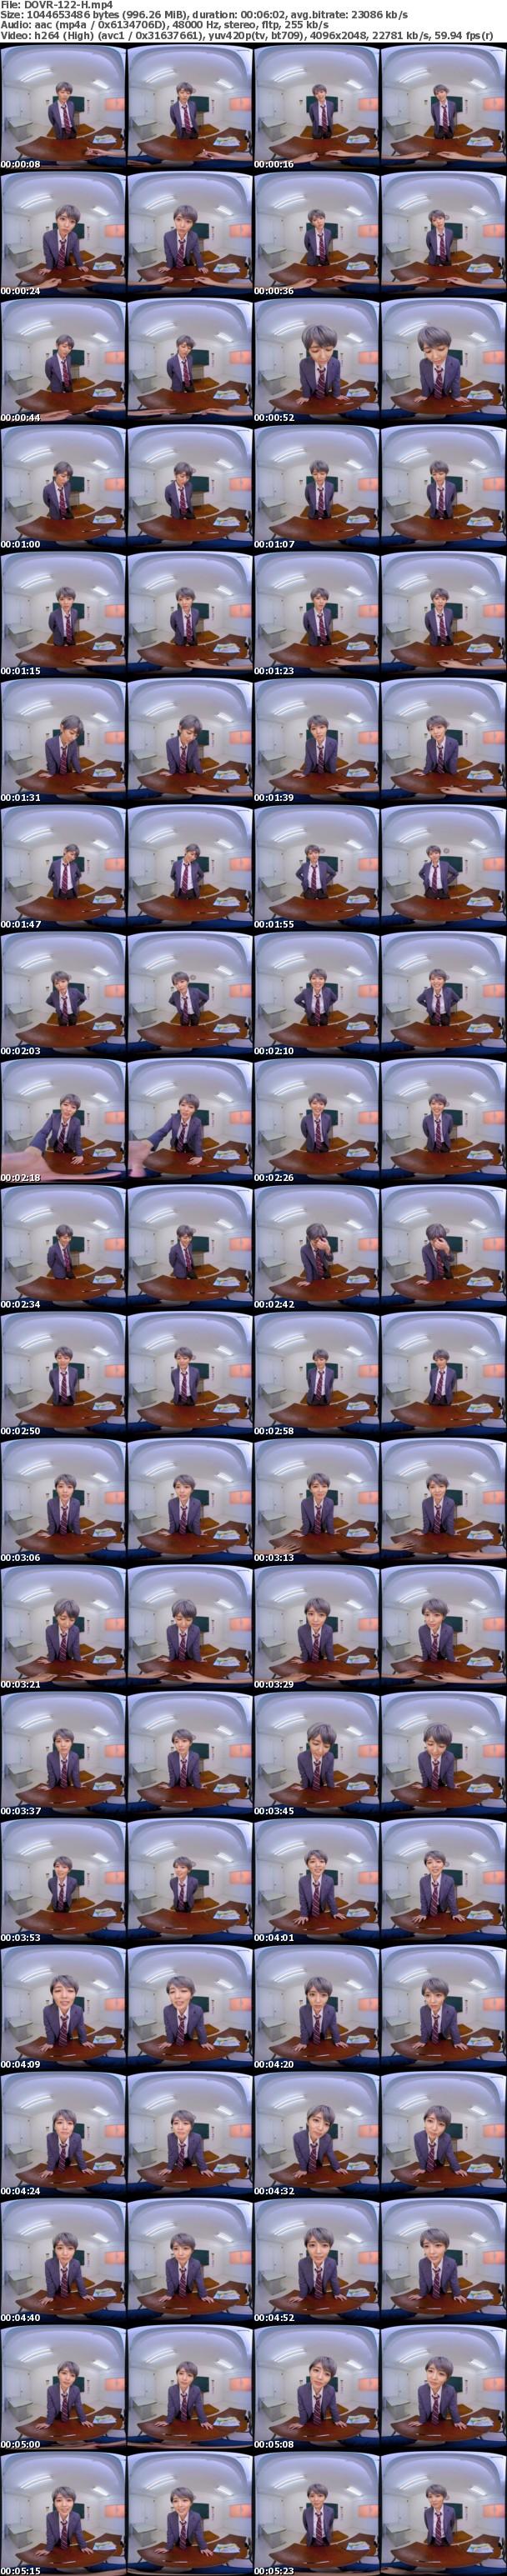 (VR) DOVR-122 【まとめ買い特典あり】「これからは他の女の人をチラ見しちゃダメだよ」束縛強め地雷系サキュバスか「お、なんか触ったらでかくなったぞ!」オラオラ系ボーイッシュ風俗嬢、あなたはどっちの美咲かんなが好き? 完全版